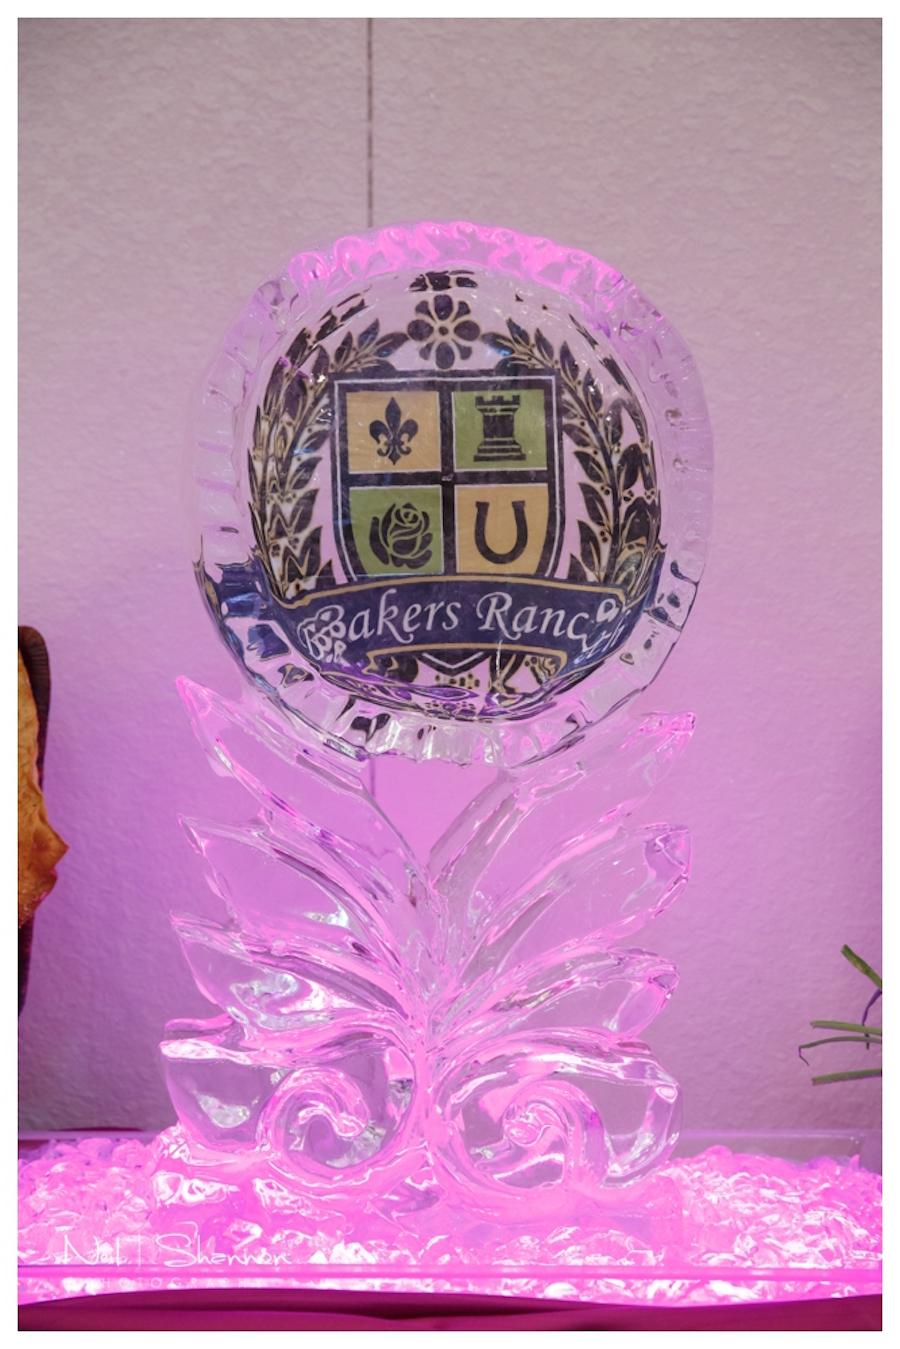 Wedding Ice Sculpture | Rustic, Elegant Sarasota Wedding Venue | Bakers Ranch